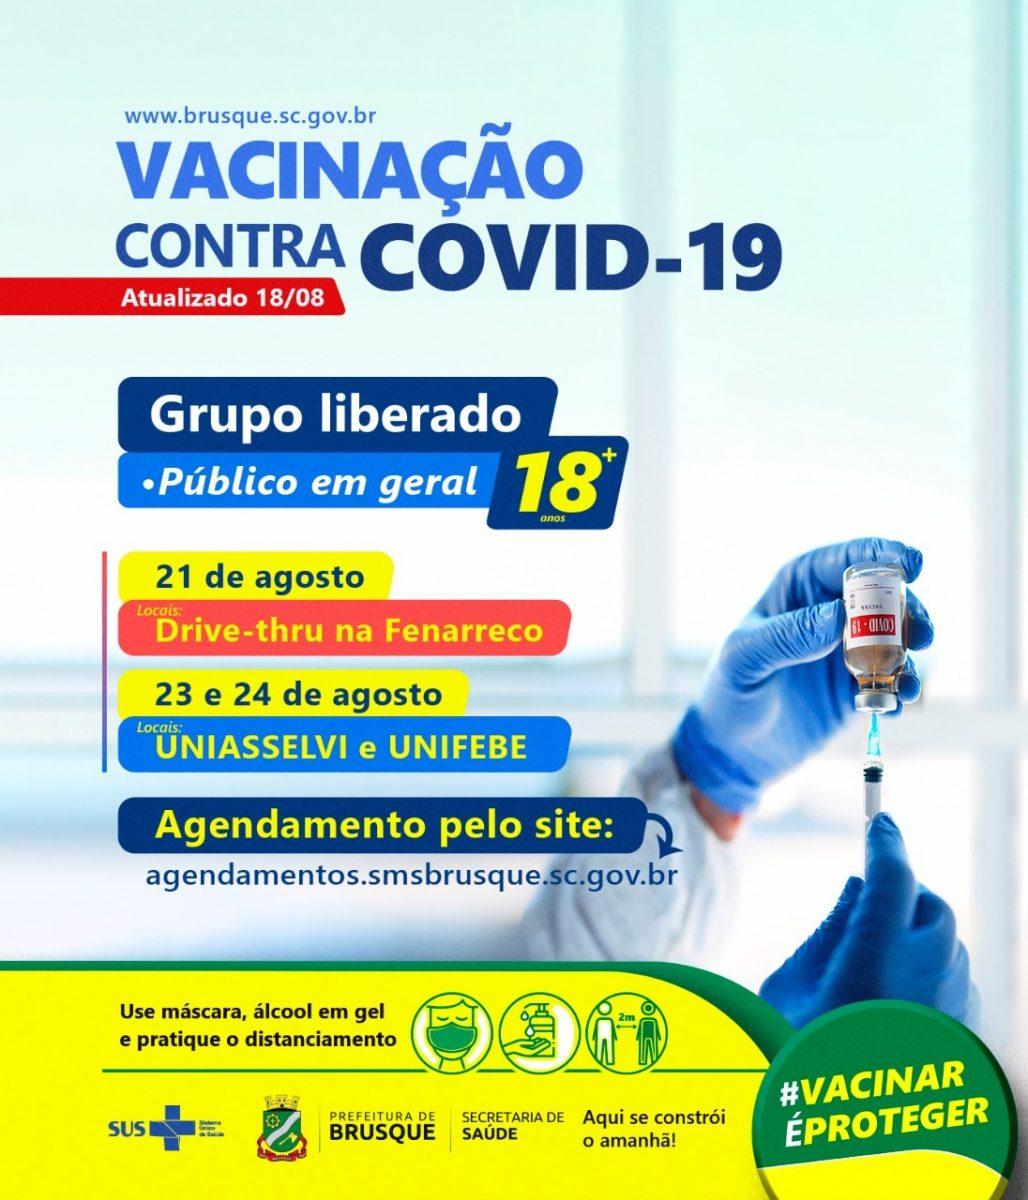 Covid-19: Brusque abre agenda para vacina ao grupo de 18 anos ou mais